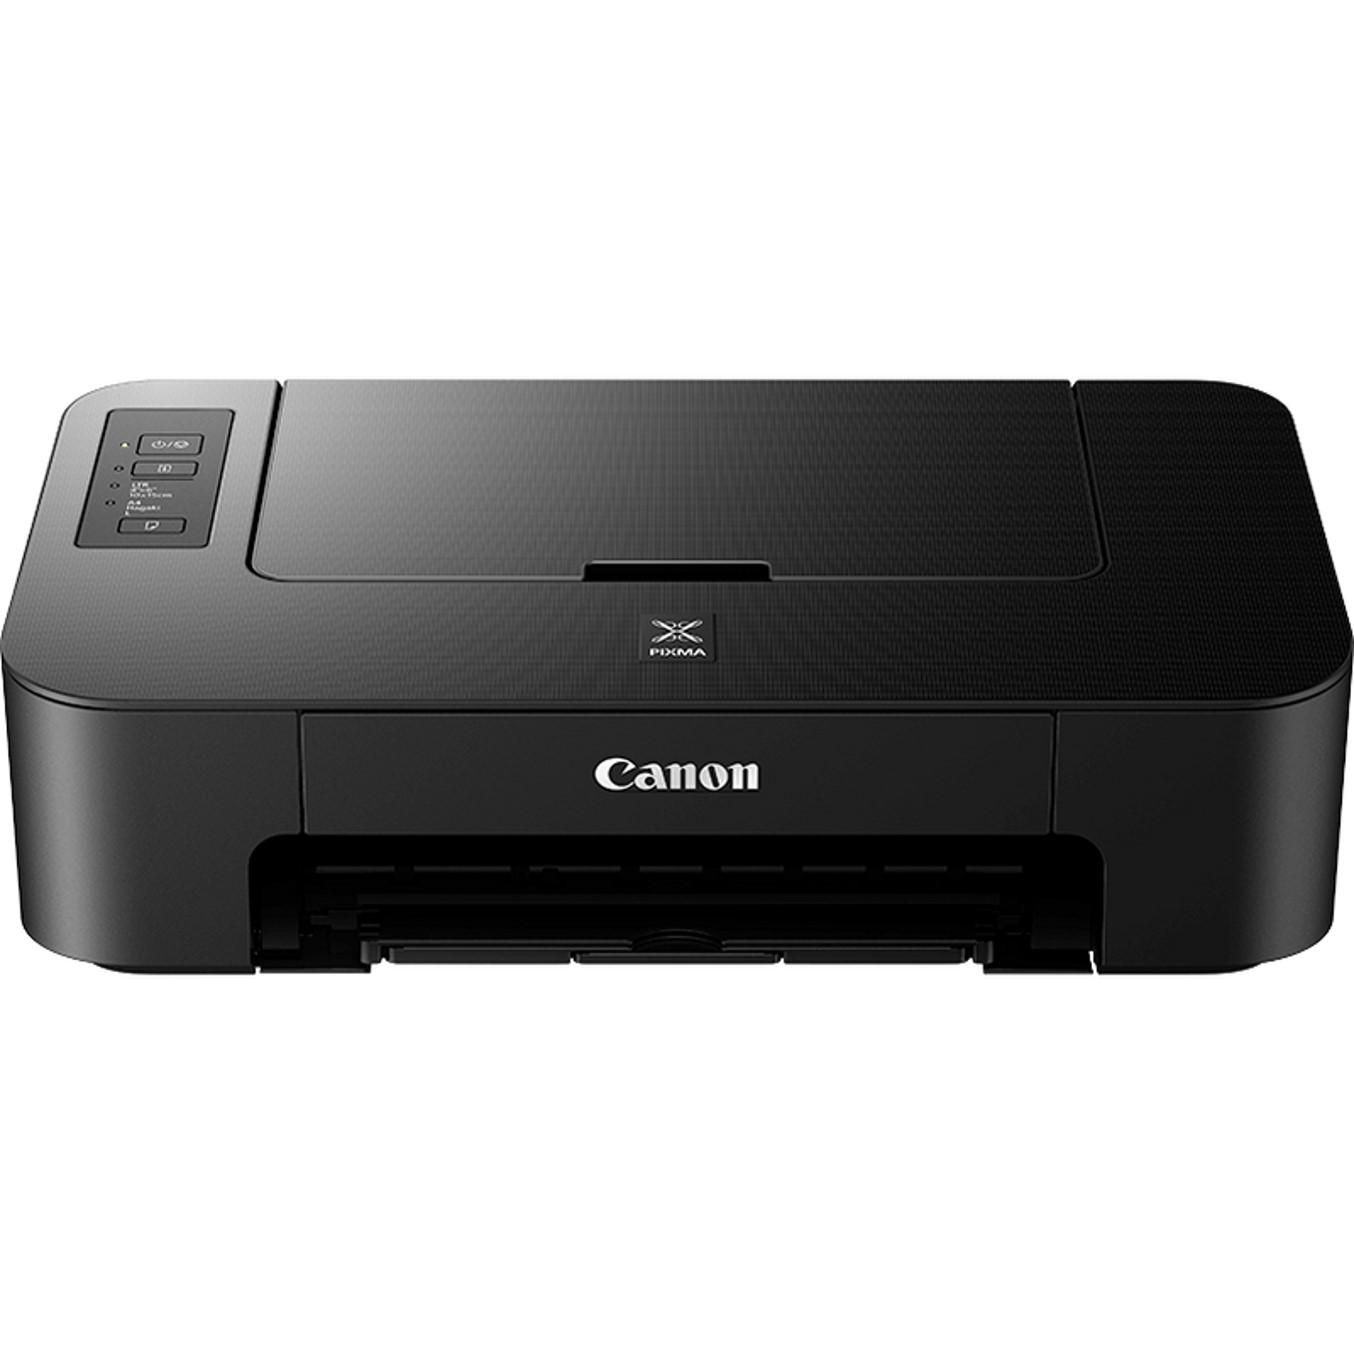 IMPRESORA CANON TS205 INYECCION COLOR PIXMA A4- 7 7PPM- 4800X1200PPM- USB